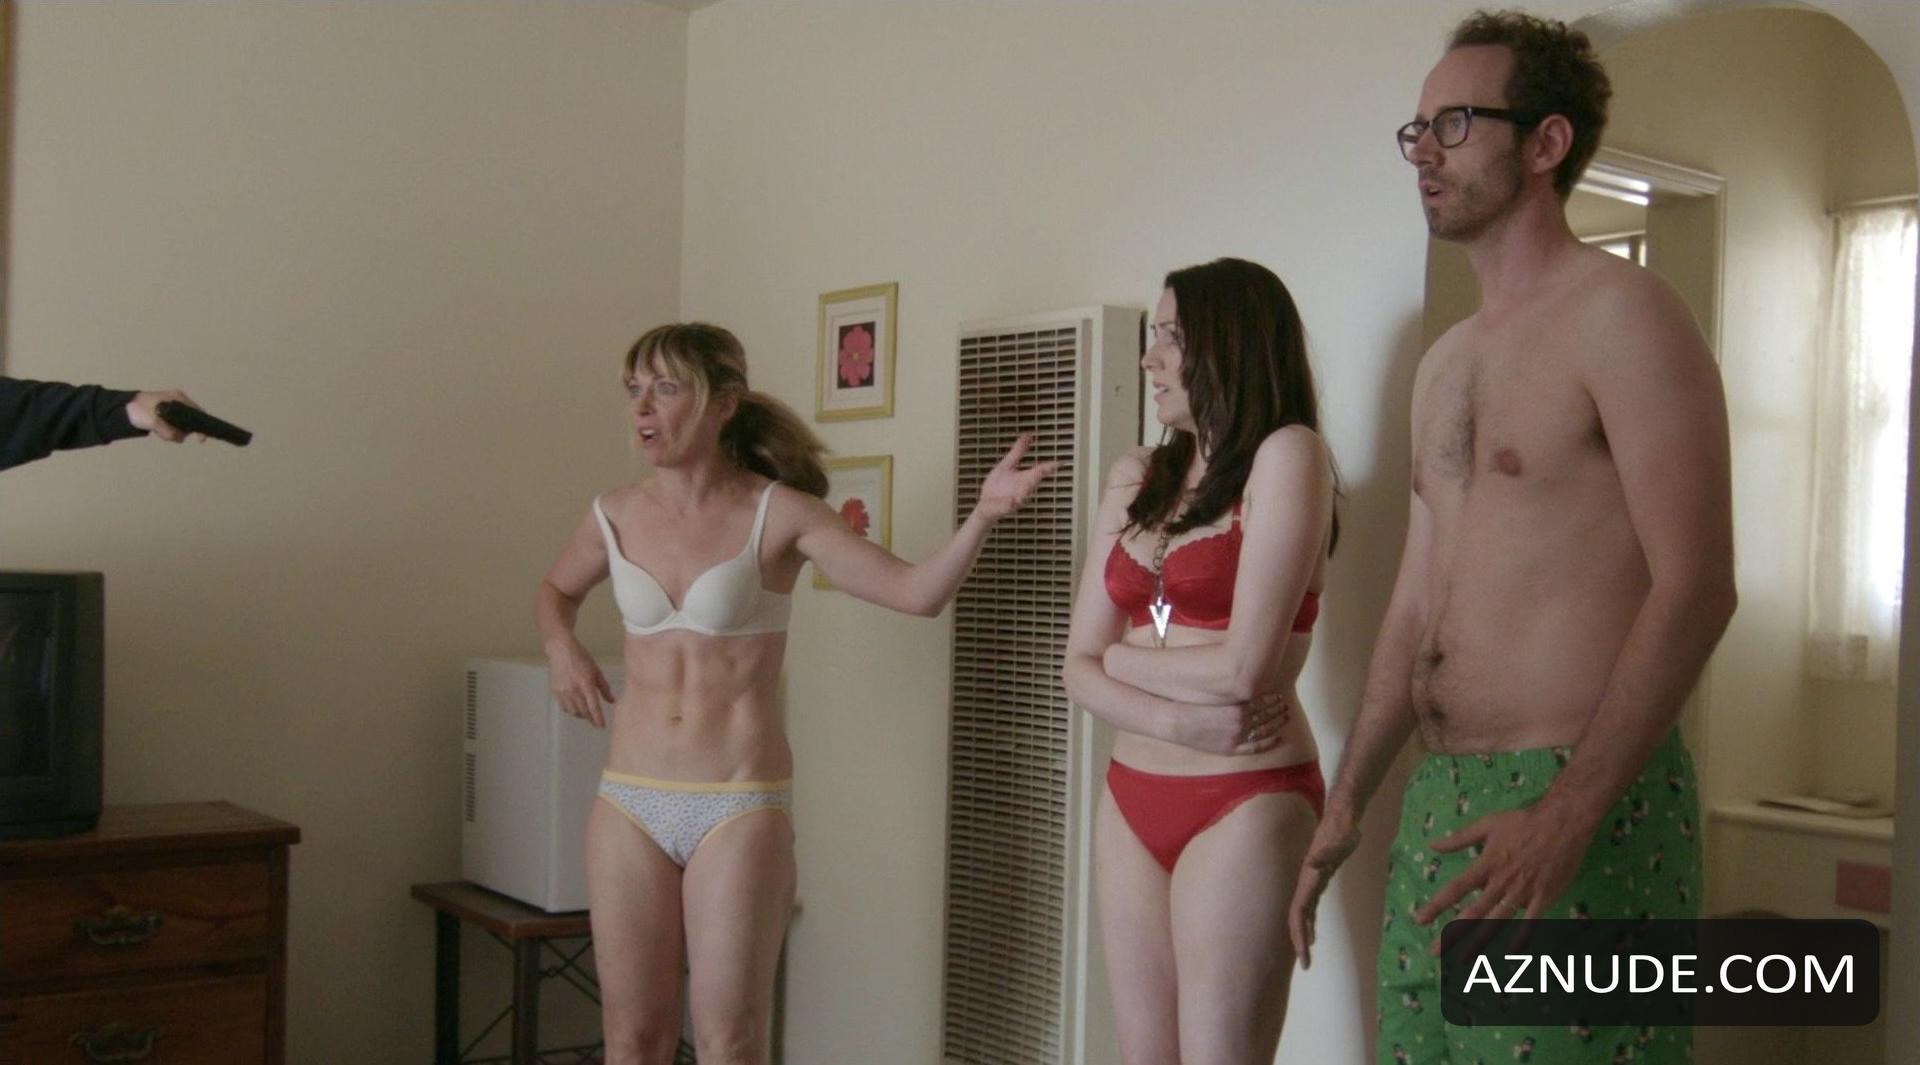 Kate connor sex tape nude (66 pics)